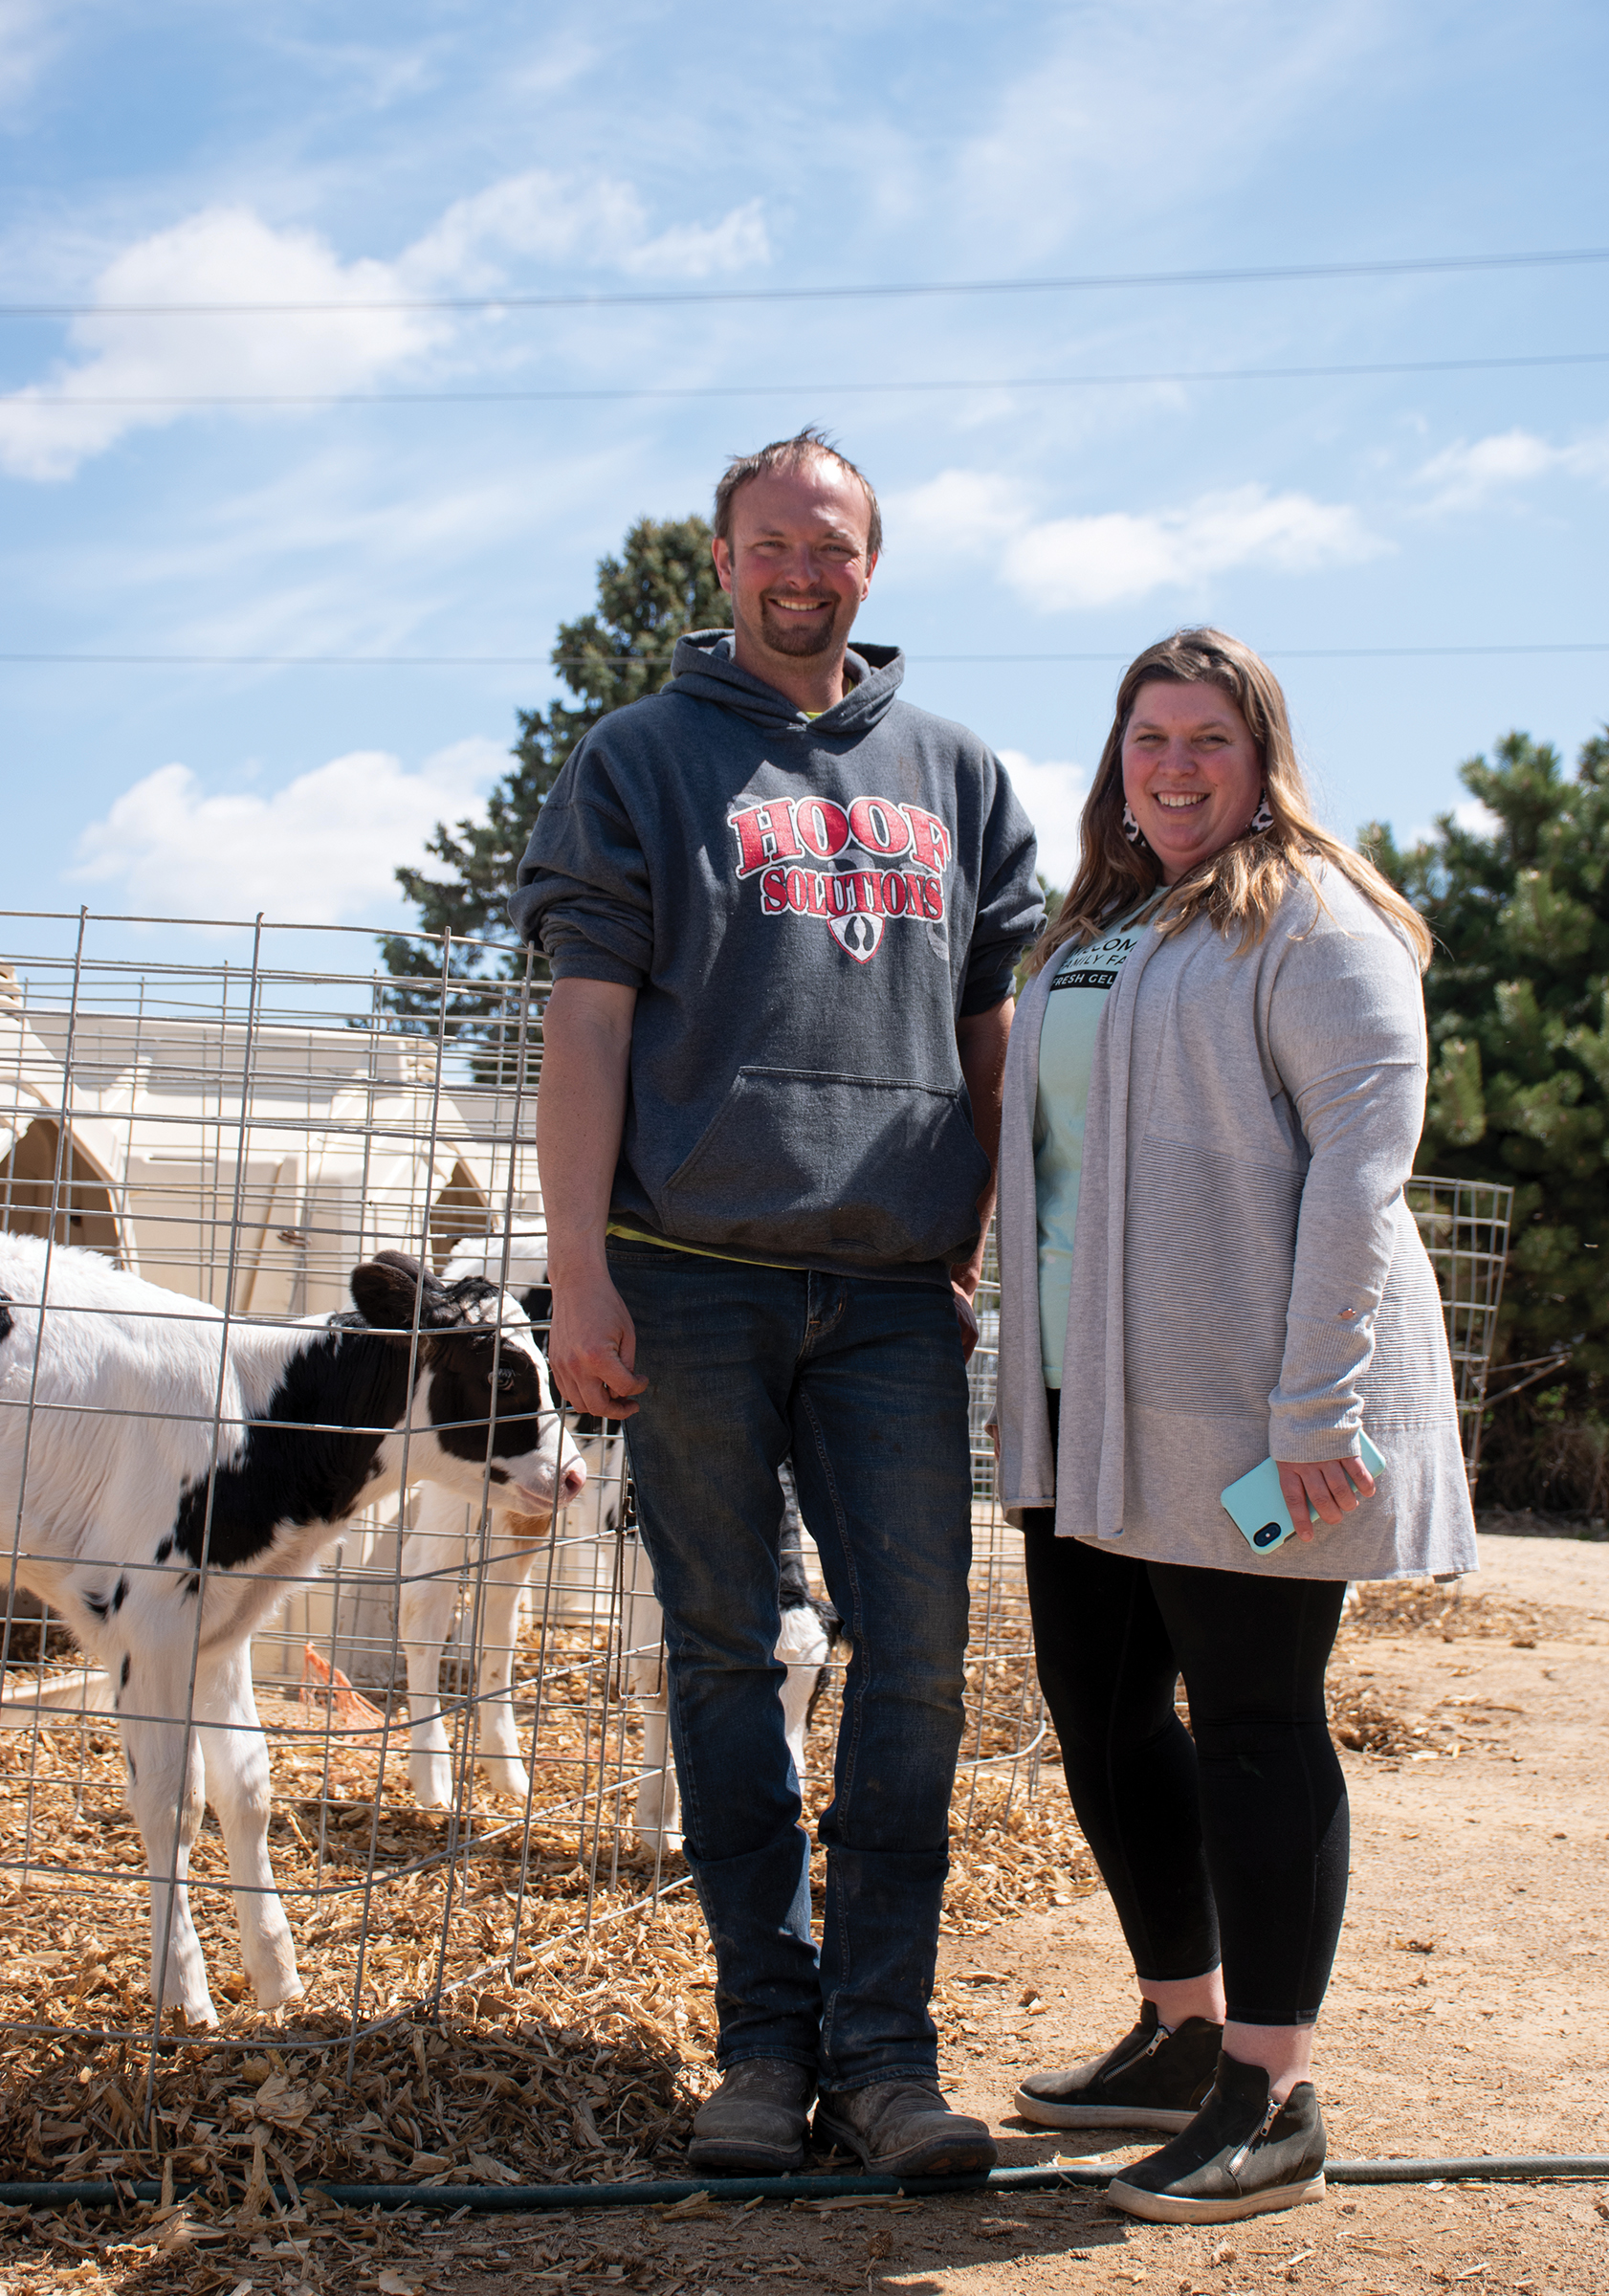 Joe-and-Amber-McComish-at-McComish-Family-Farm